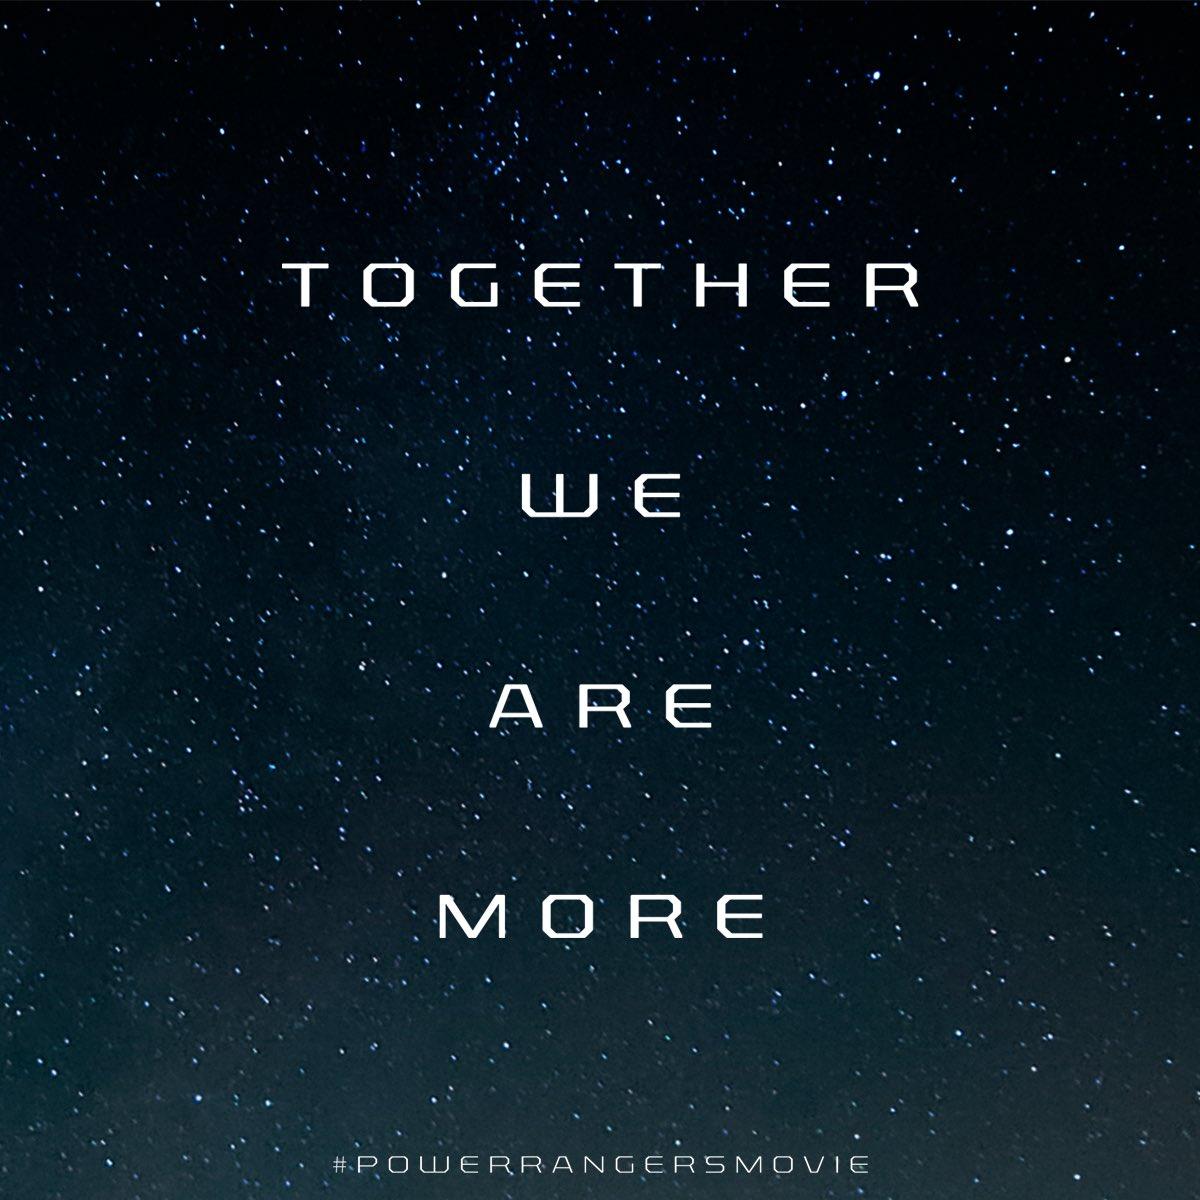 ⚡️️#PowerRangersMovie teaser poster - Coming Tomorrow! #TogetherWeAreMore https://t.co/2seZYPSKqB